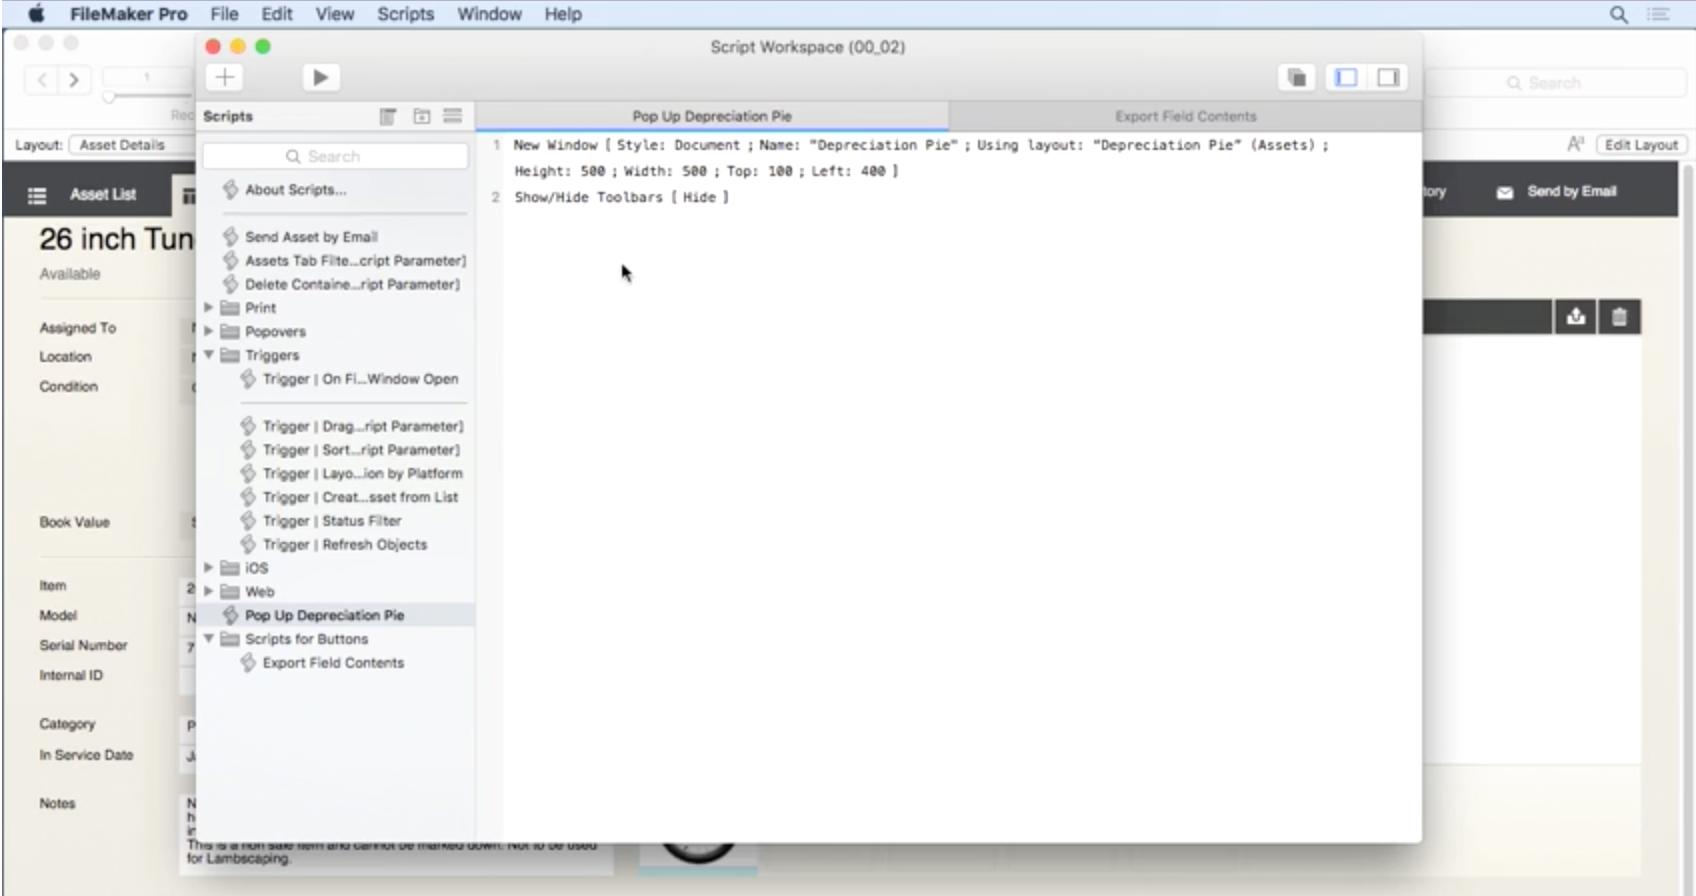 Claris FileMaker Software - Script workspace